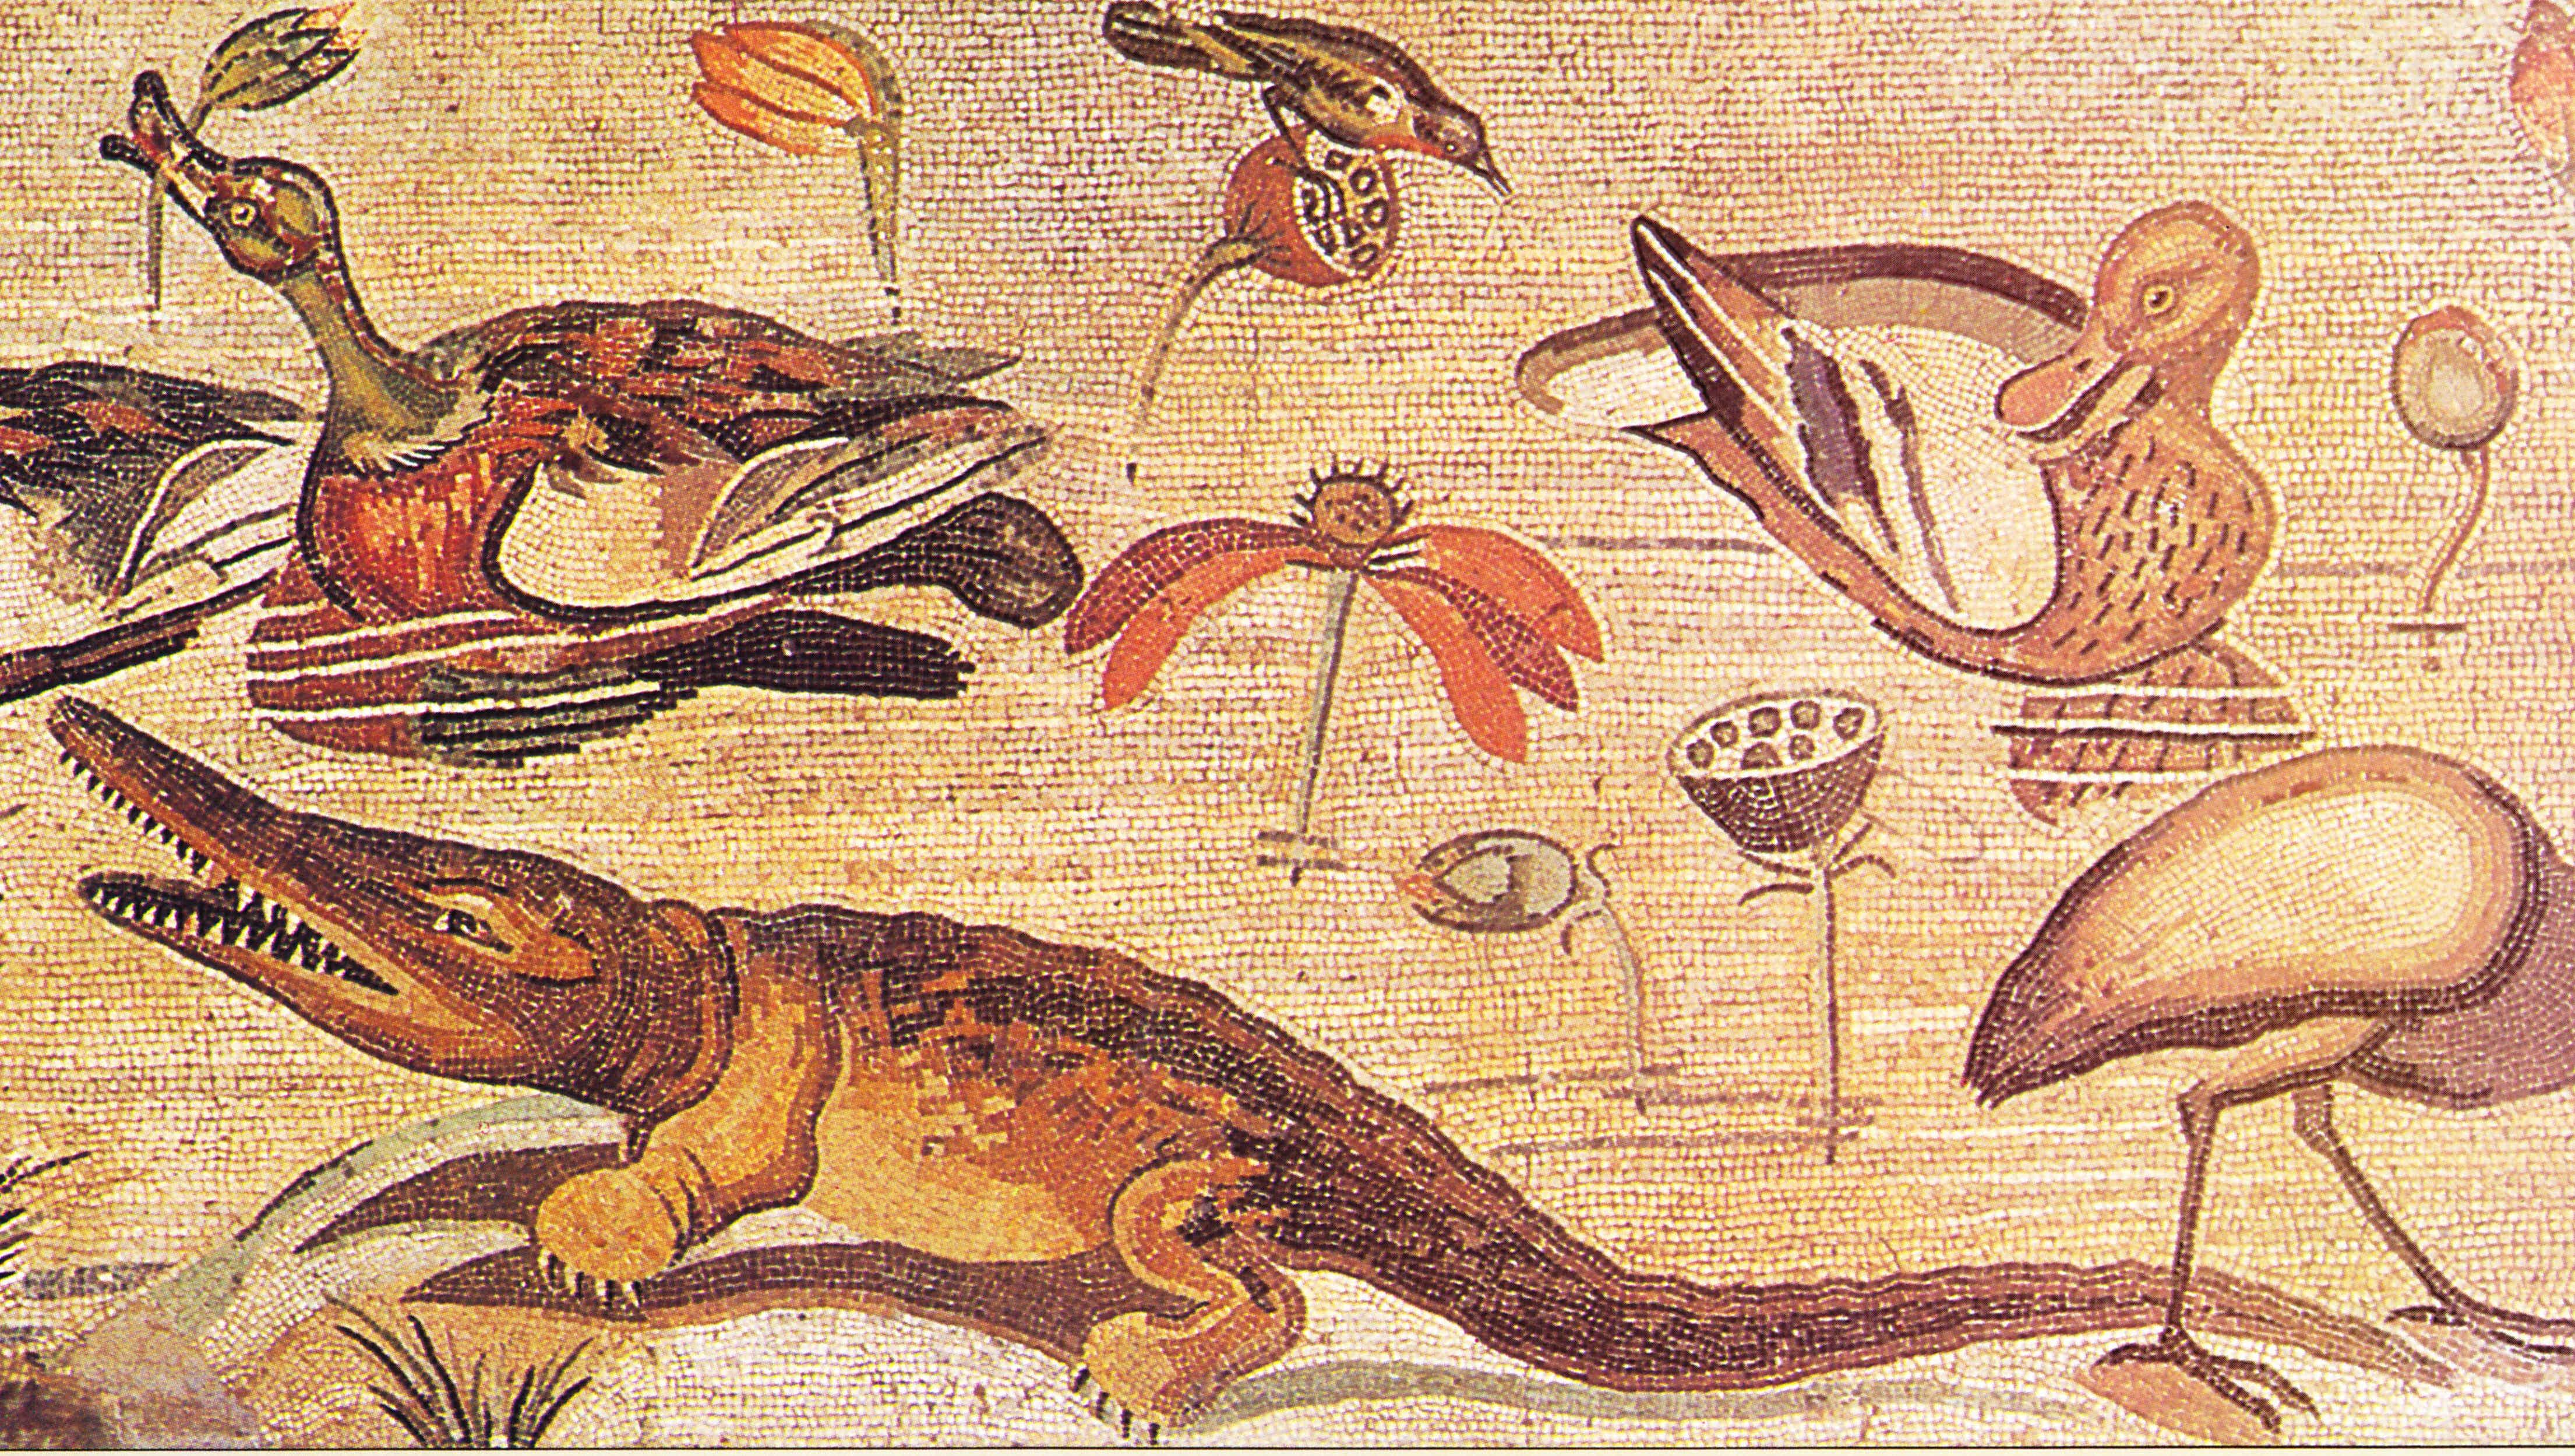 Egipto Antiguo 62 y Ptolomeo XII 5